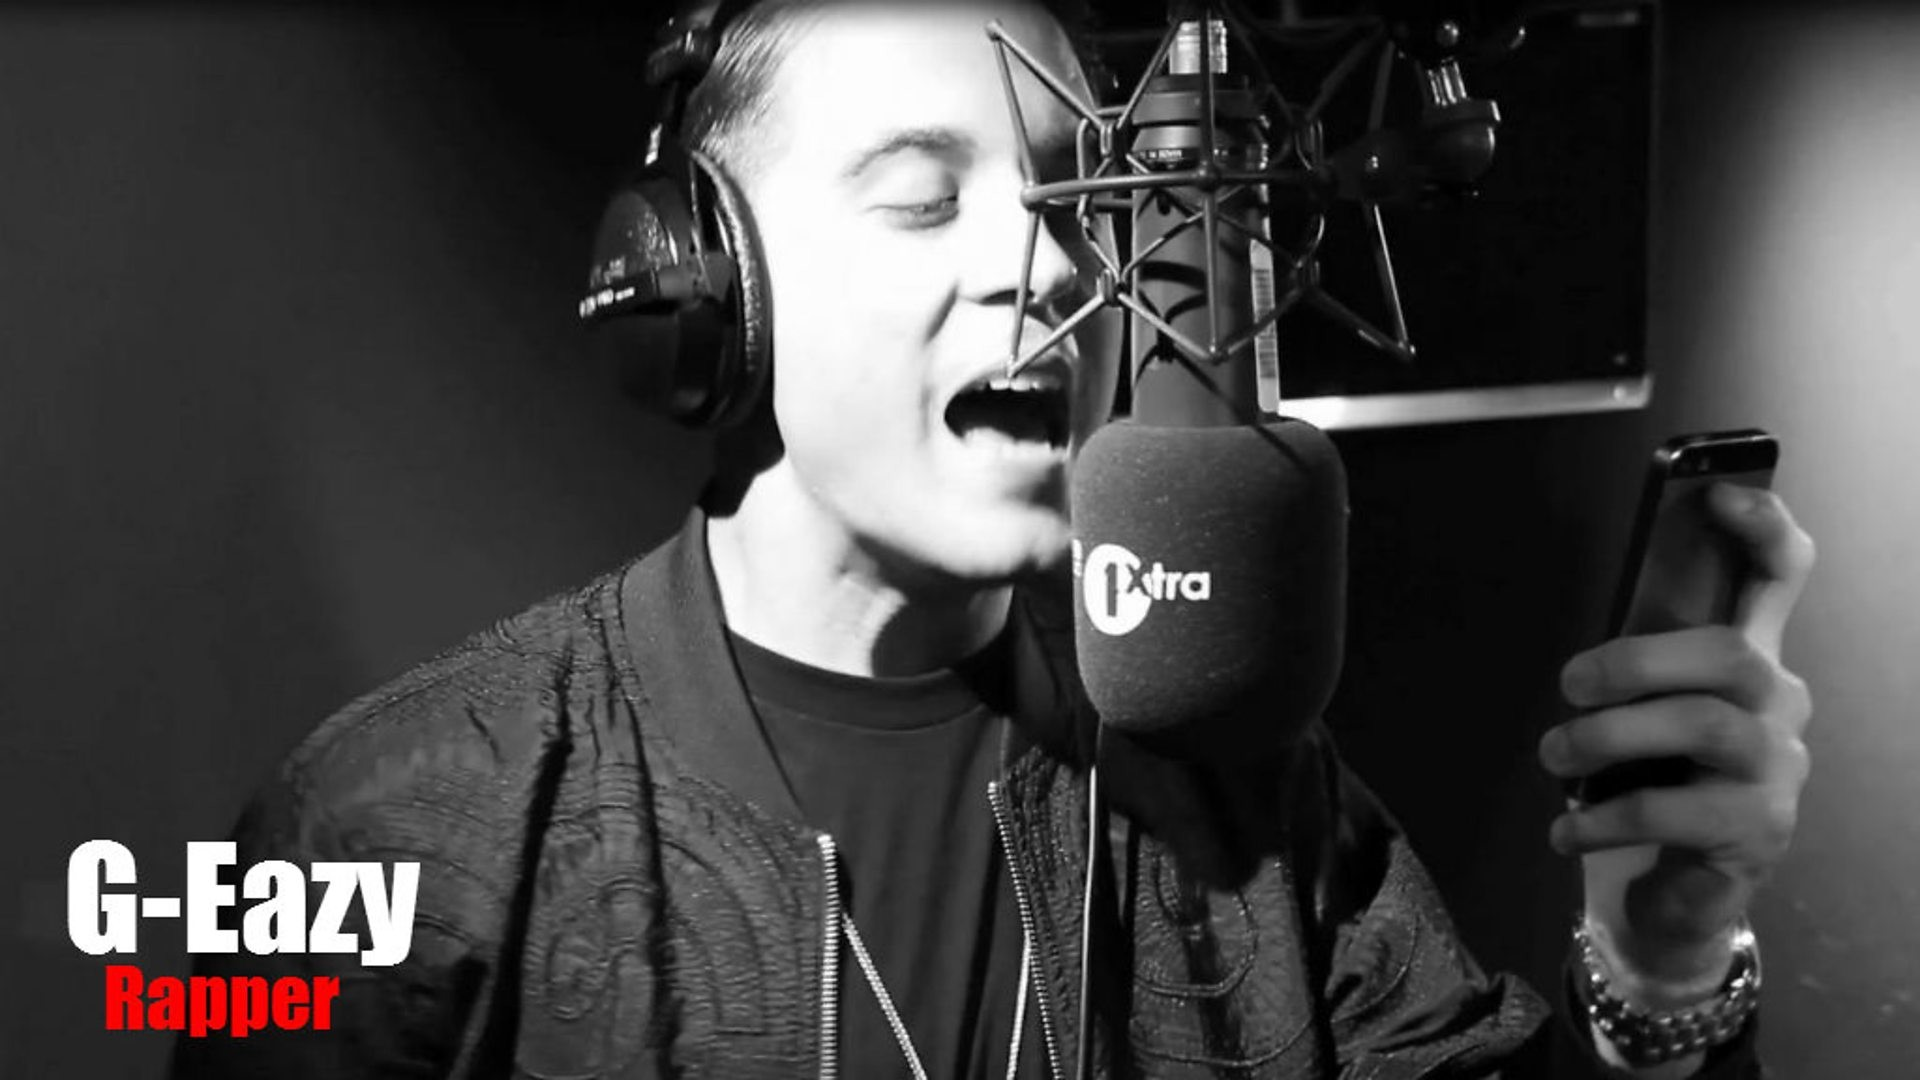 BBC Radio 1 – The Rap Show with Charlie Sloth, G-Eazy Fire in the Booth, G- Eazy – Fire In The Booth